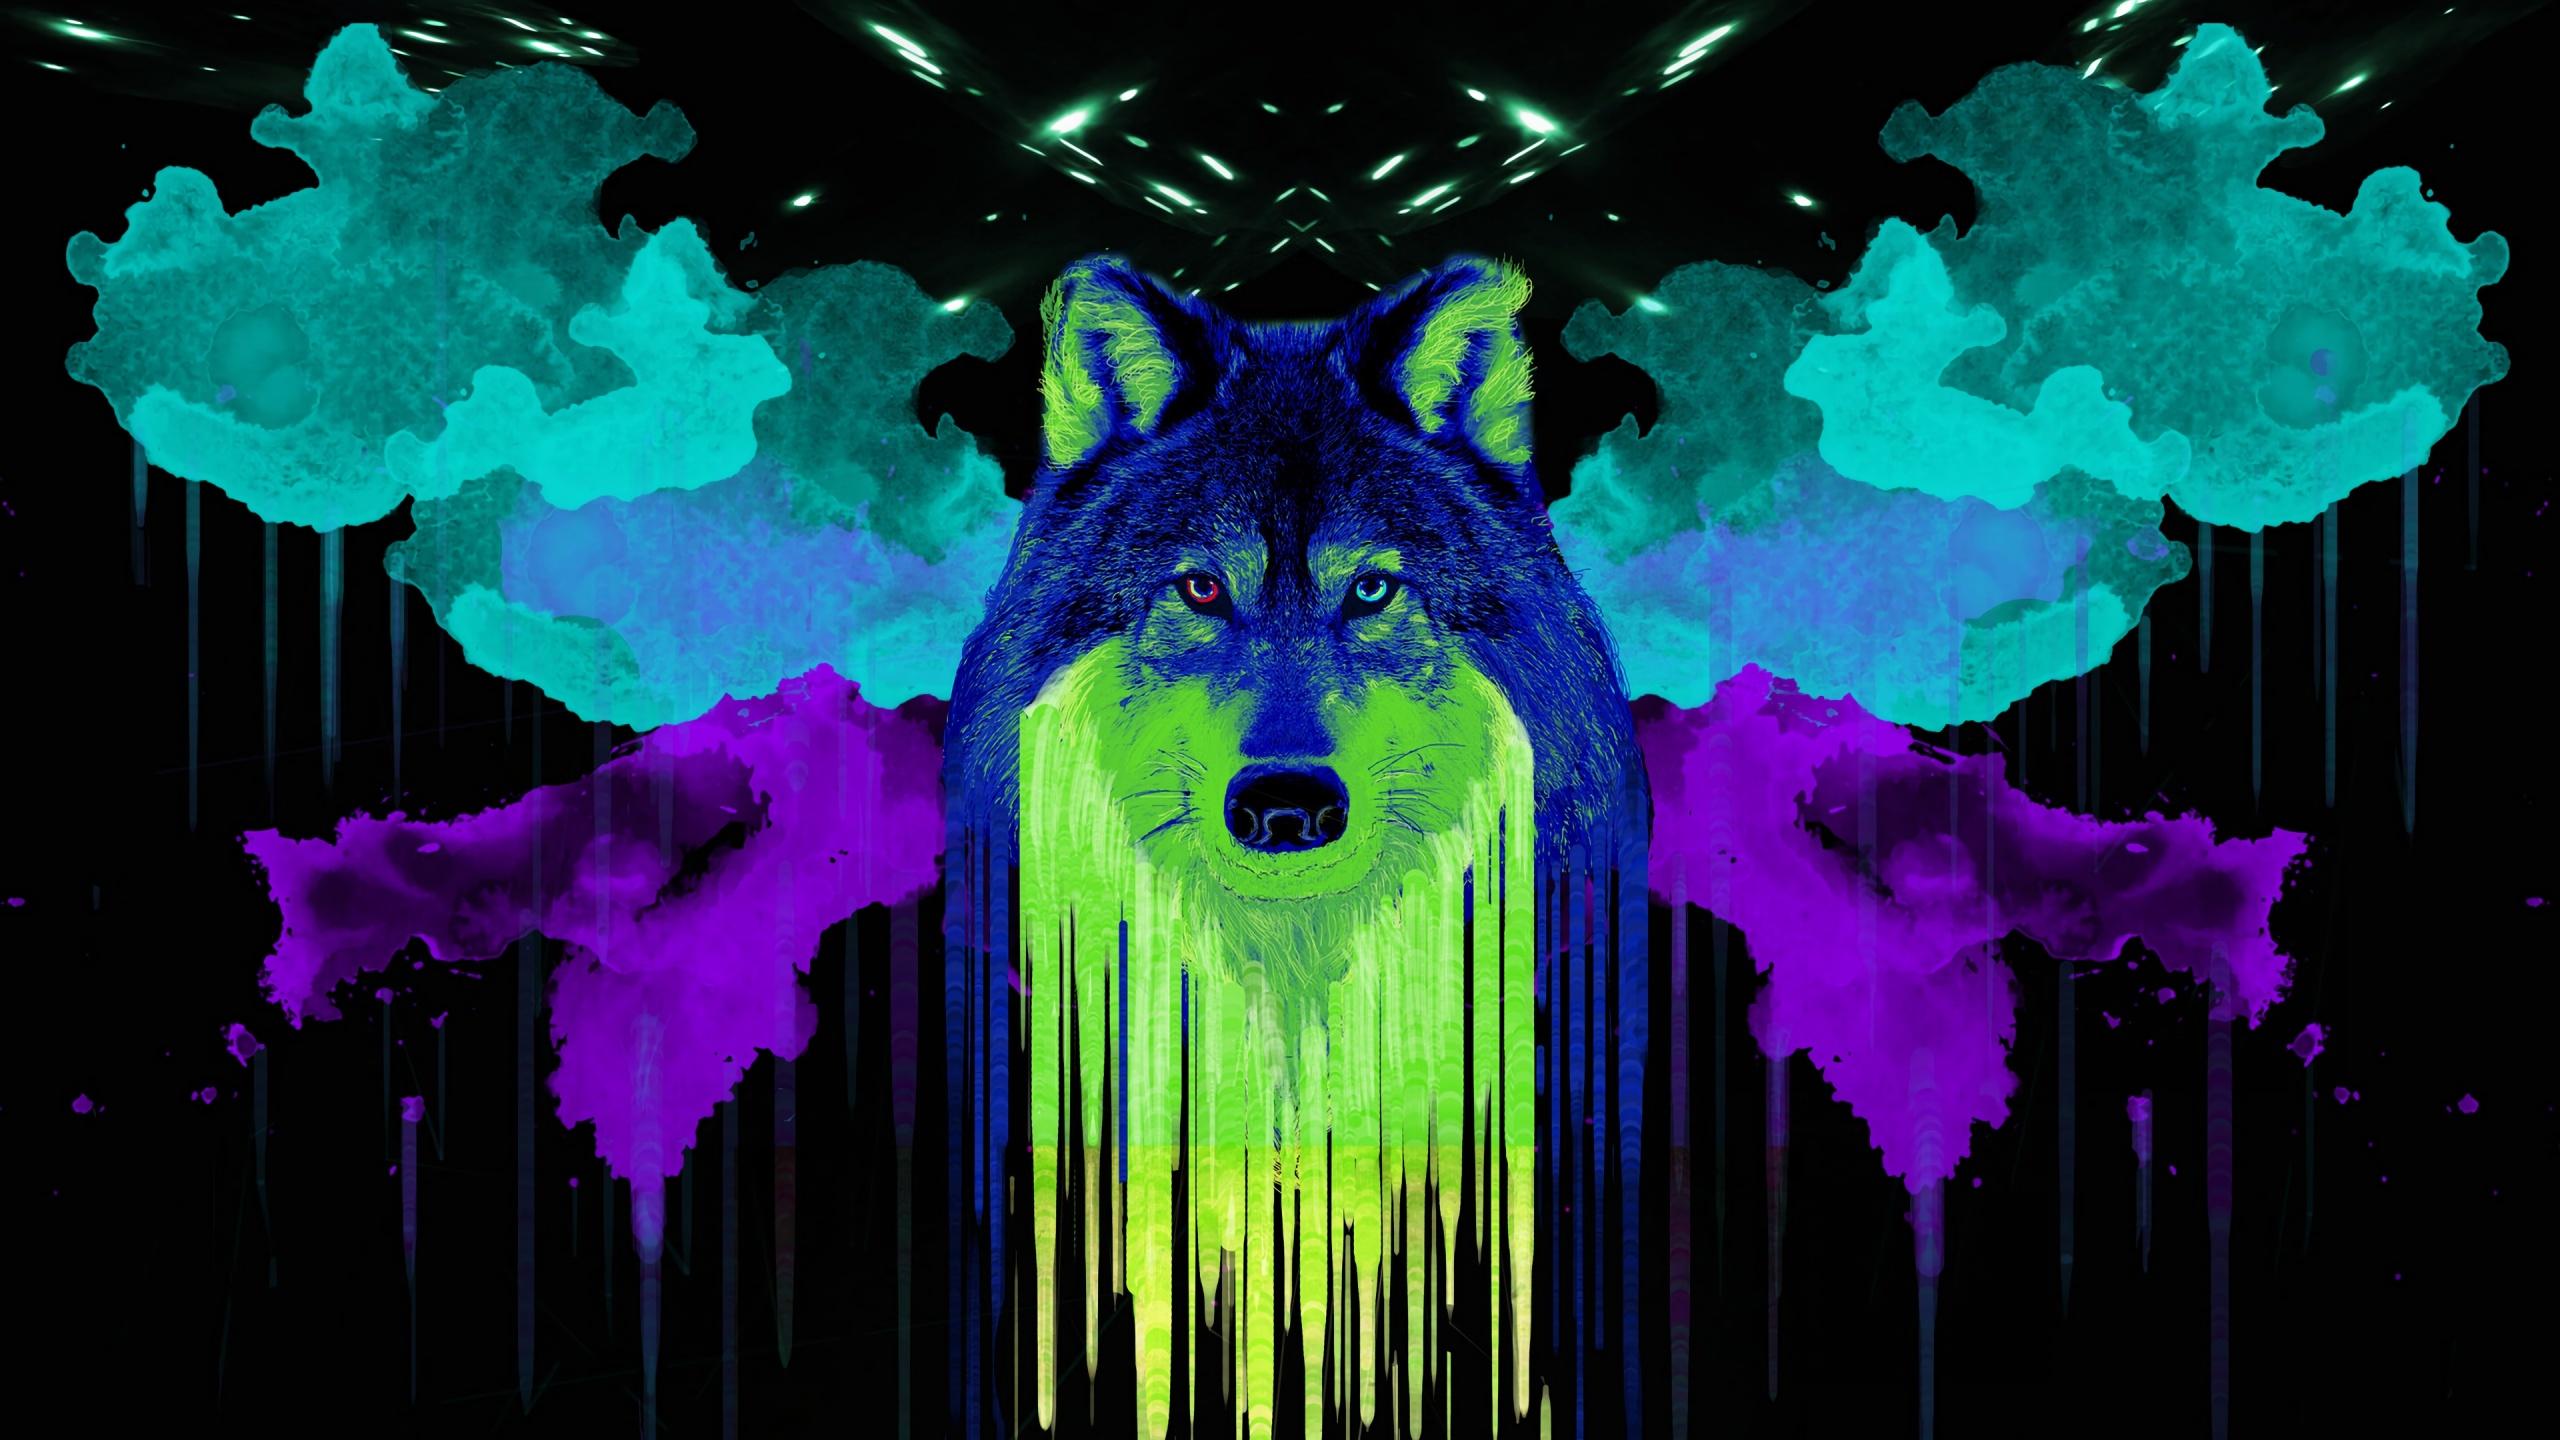 Wolf 4k Wallpaper Artwork Neon Black Background Watercolors Painting Graphics Cgi 2029